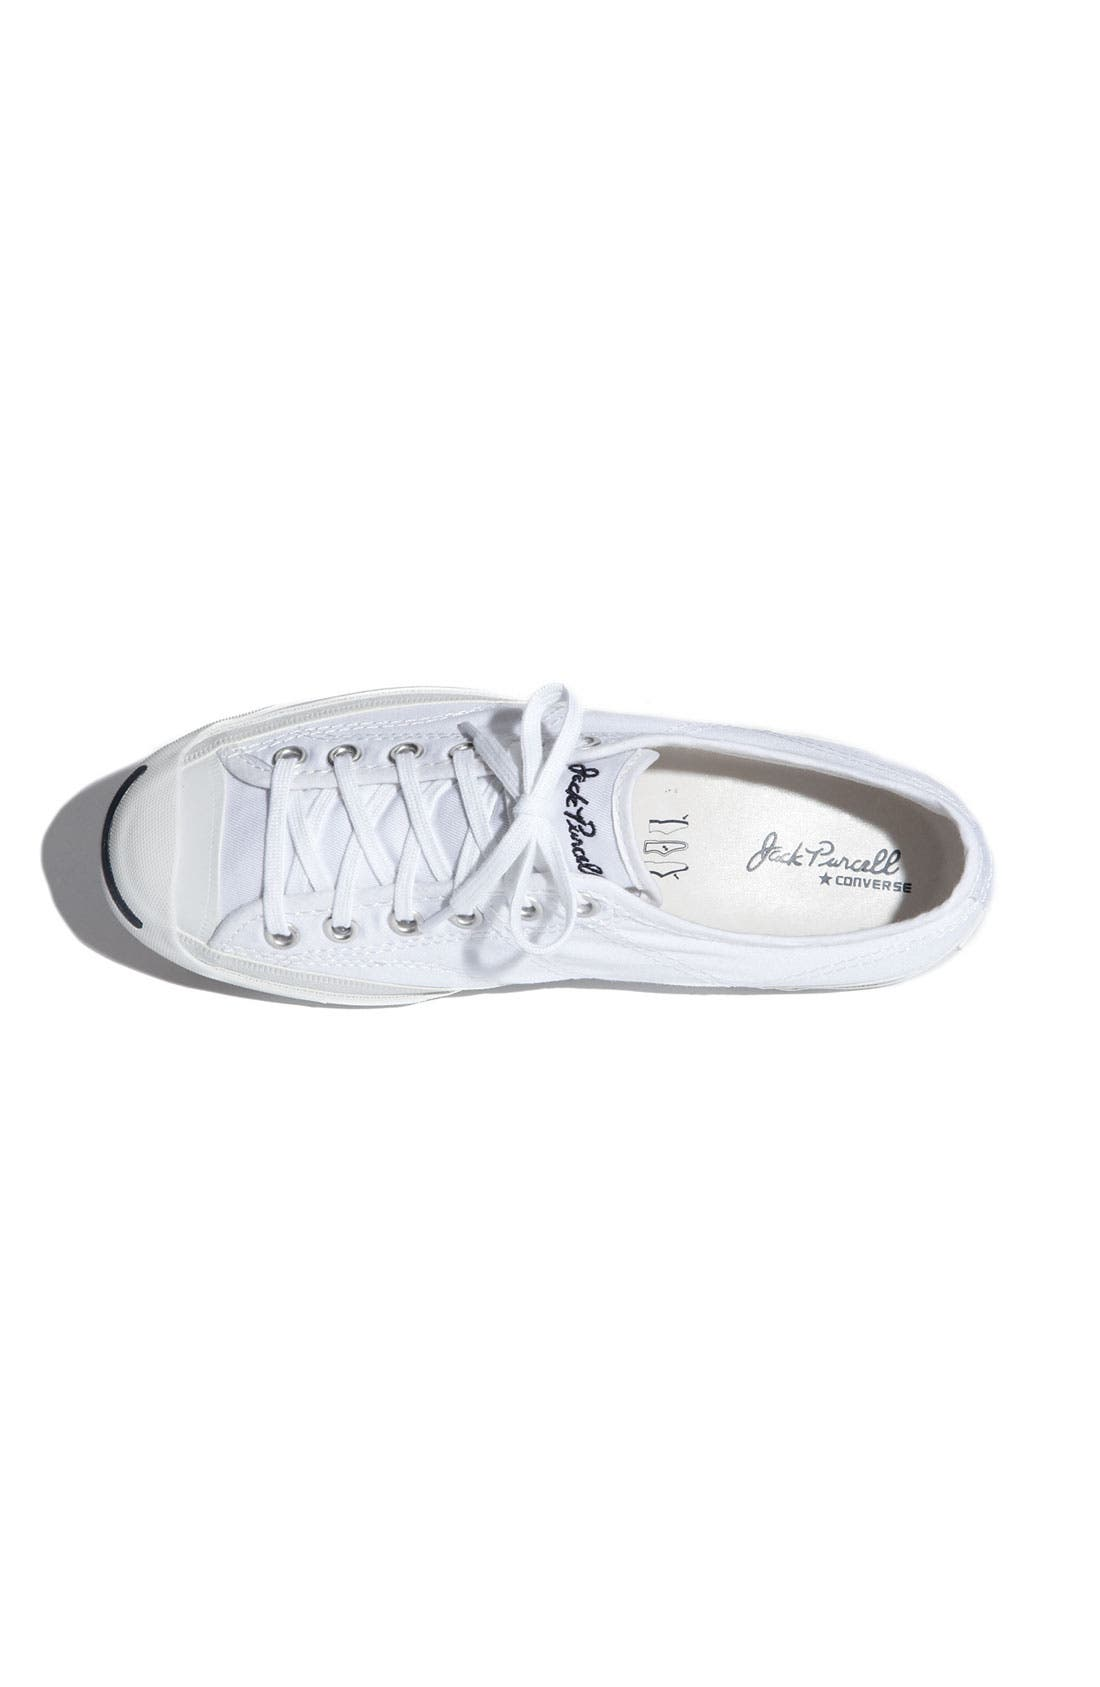 Alternate Image 3  - Converse 'Jack Purcell - Helen' Sneaker